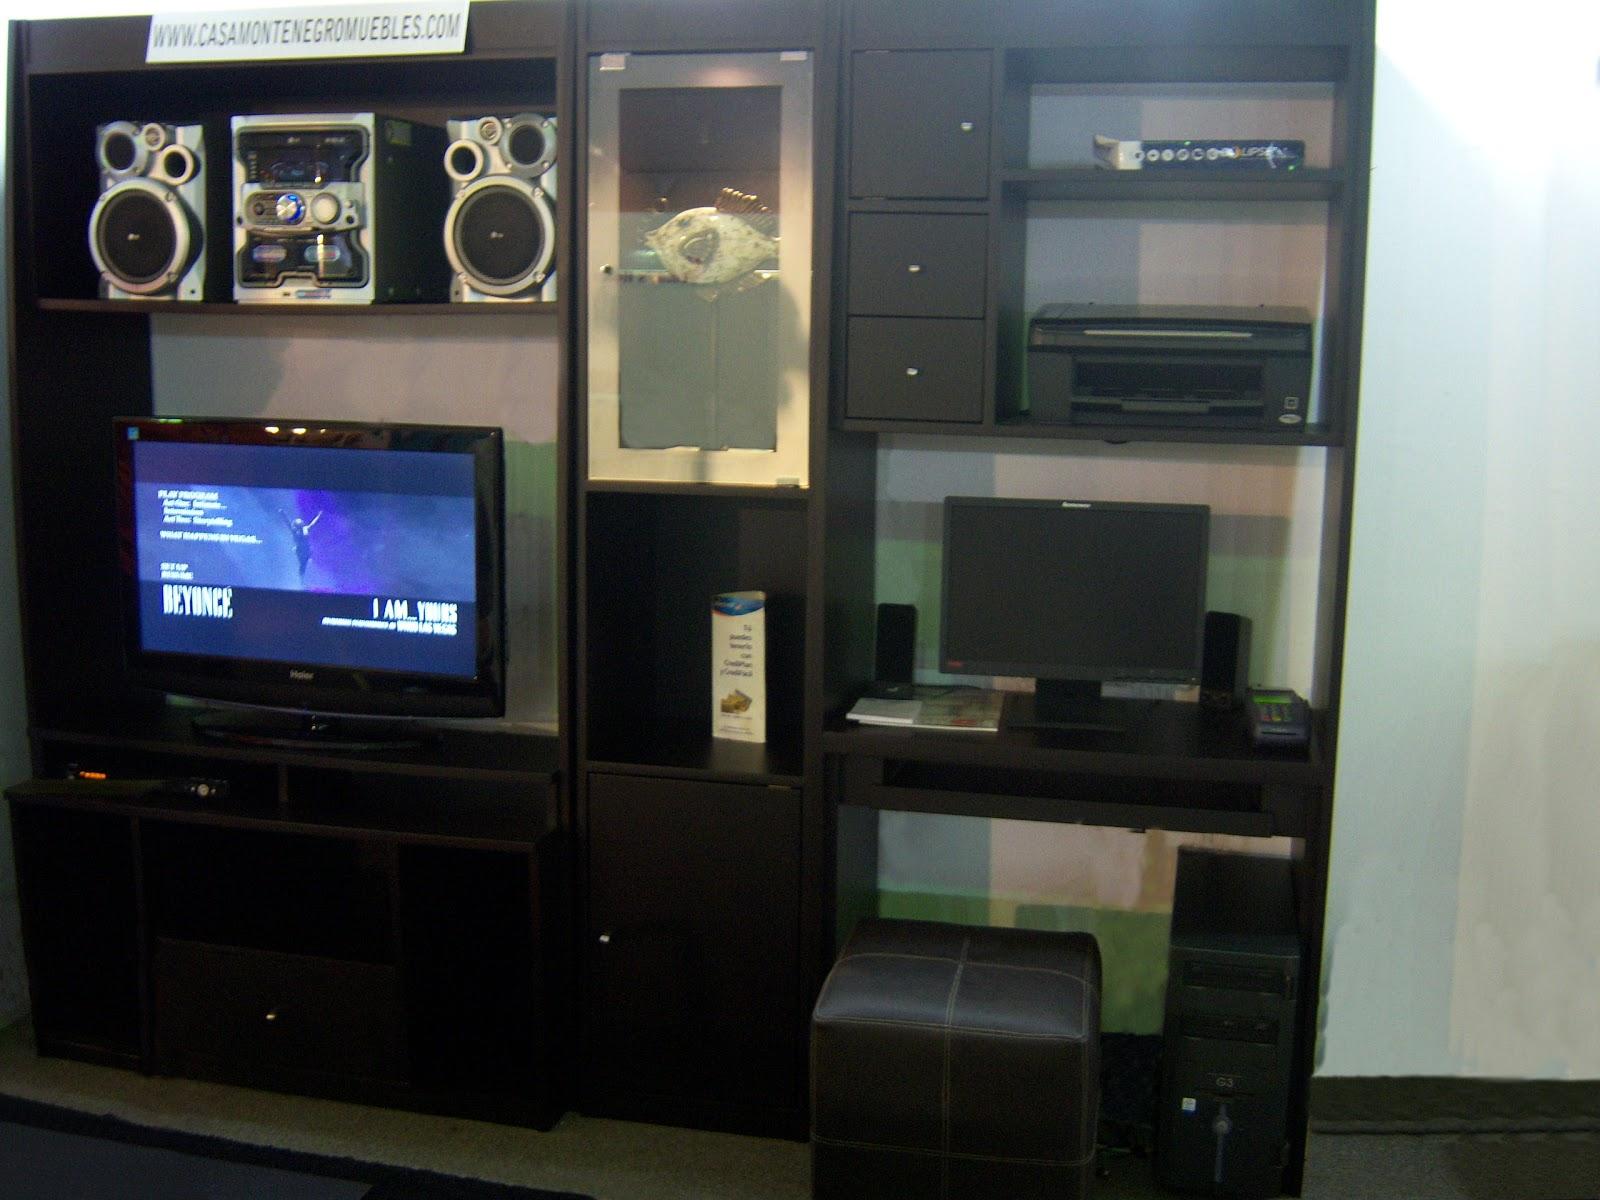 CASA MONTENEGRO MUEBLES 0424 24271290412 3244398 mayo 2012